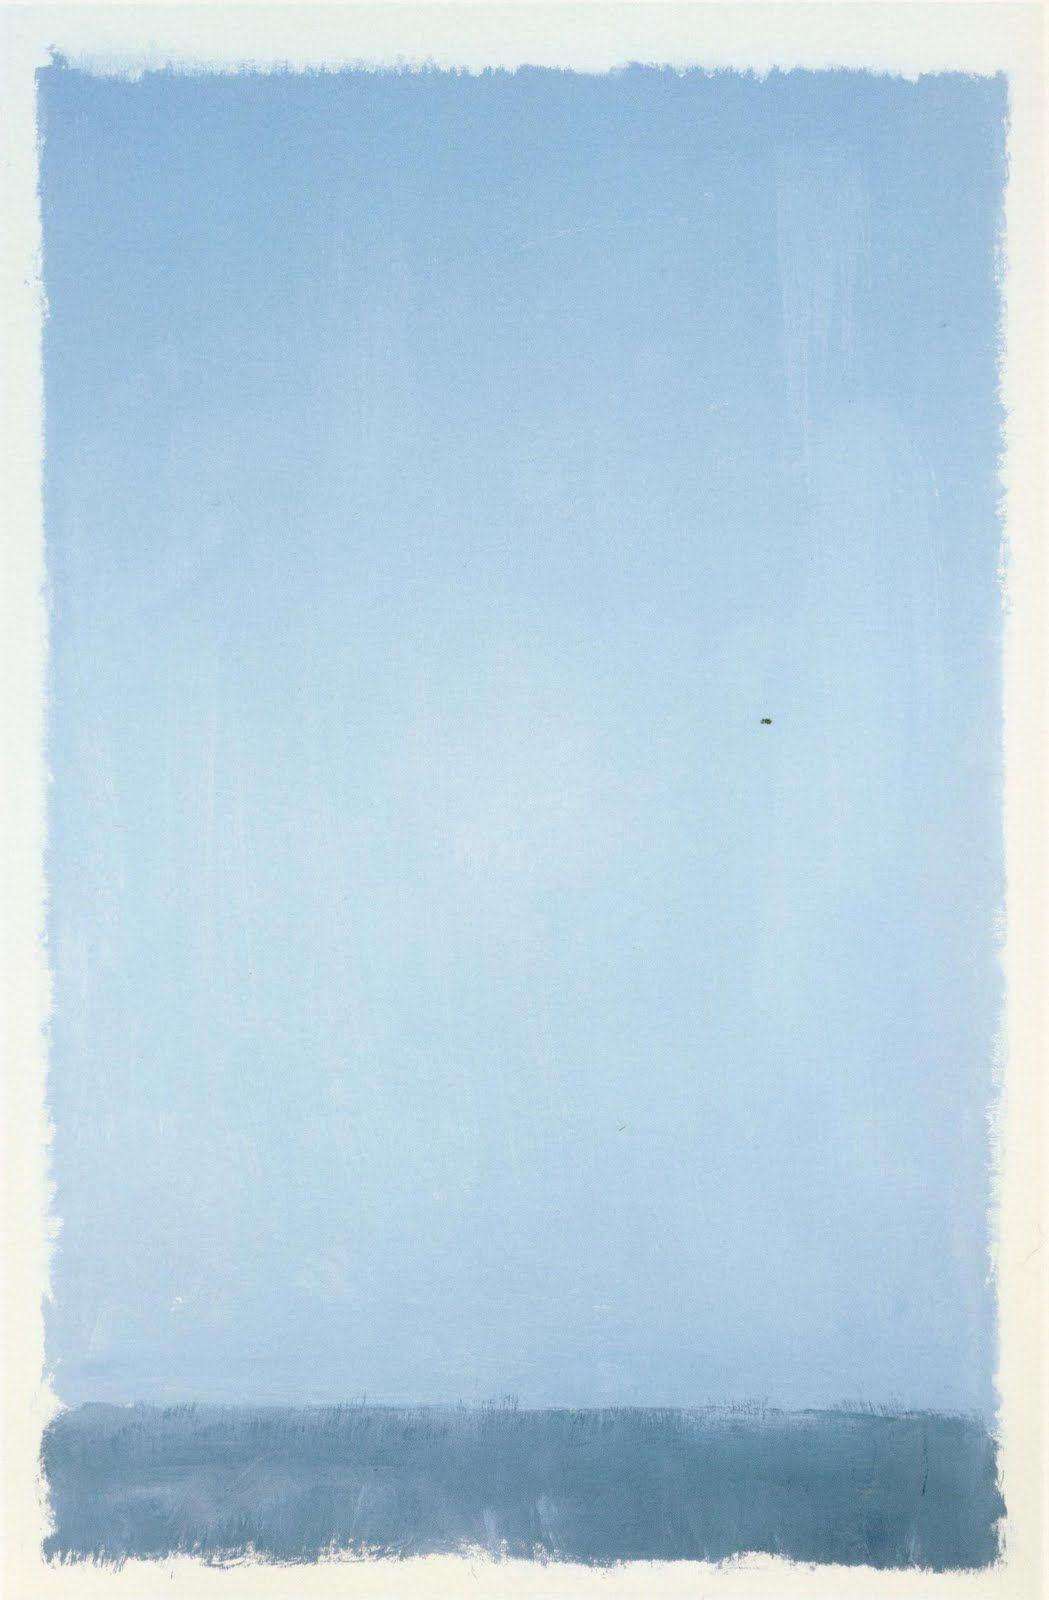 zencalendar:  The bluebird carries on the sky on his back. —Henry David Thoreau Illustration by Mark Rothko